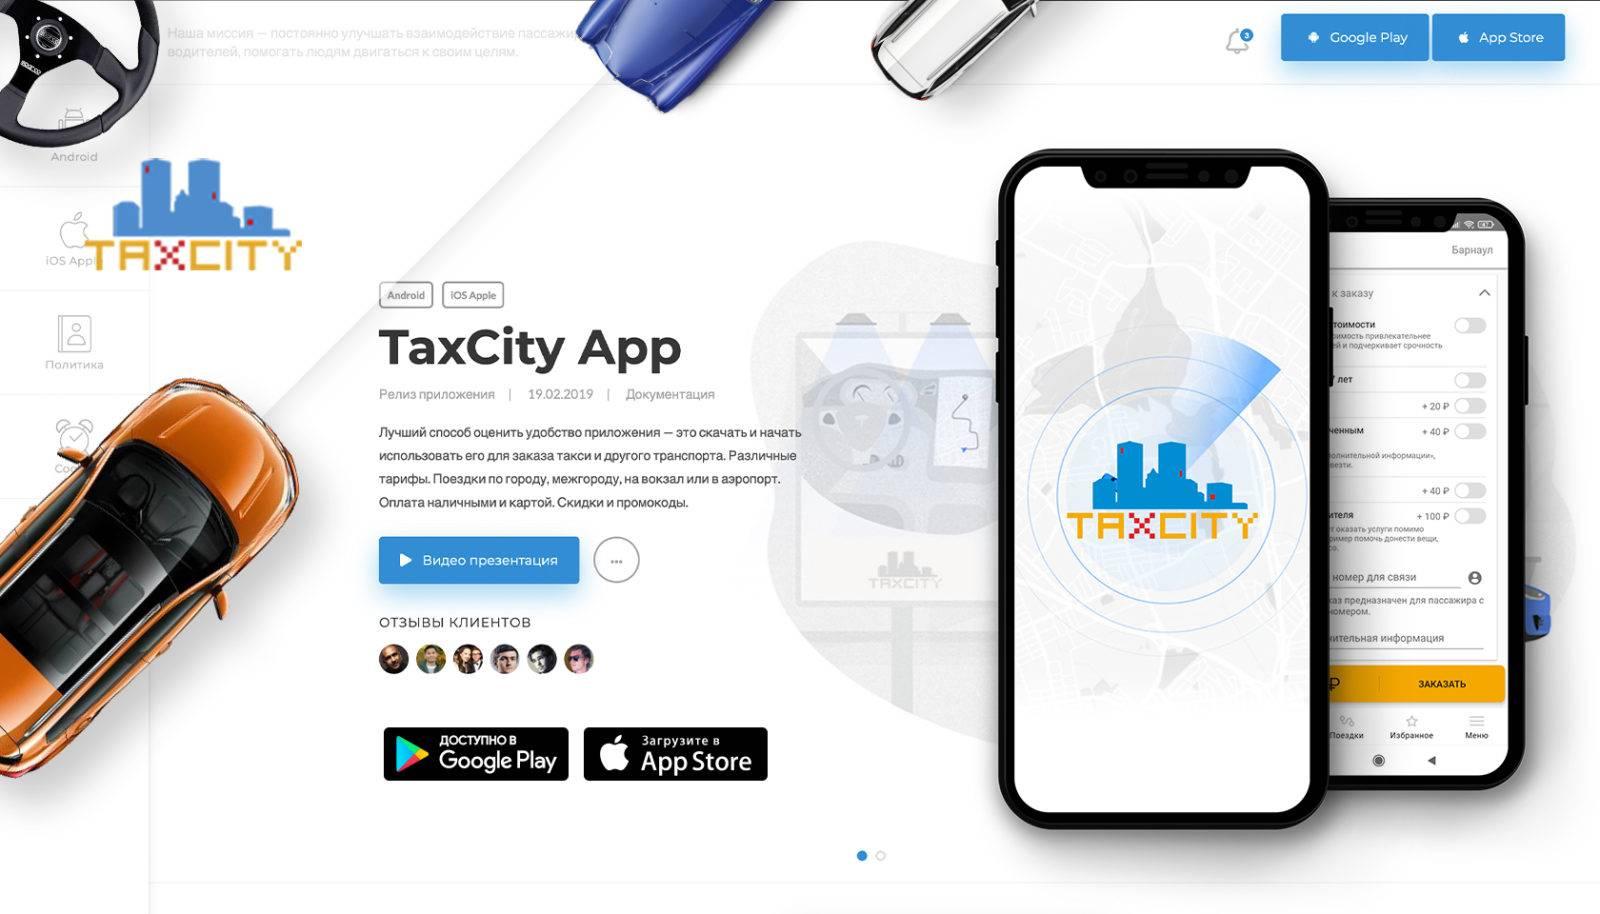 TaxCity App